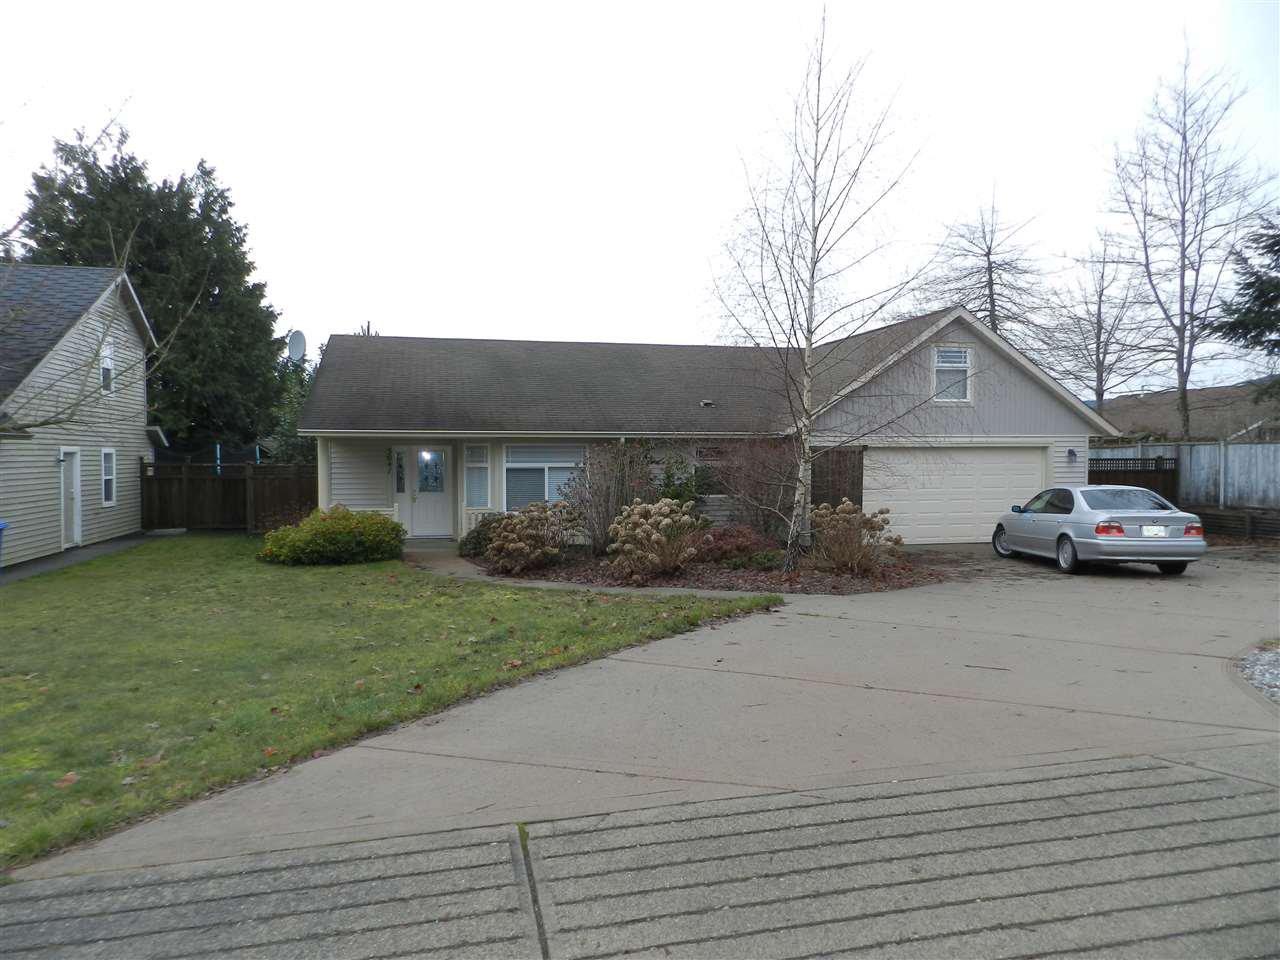 Main Photo: 5641 NICKERSON Road in Sechelt: Sechelt District House for sale (Sunshine Coast)  : MLS®# R2189858